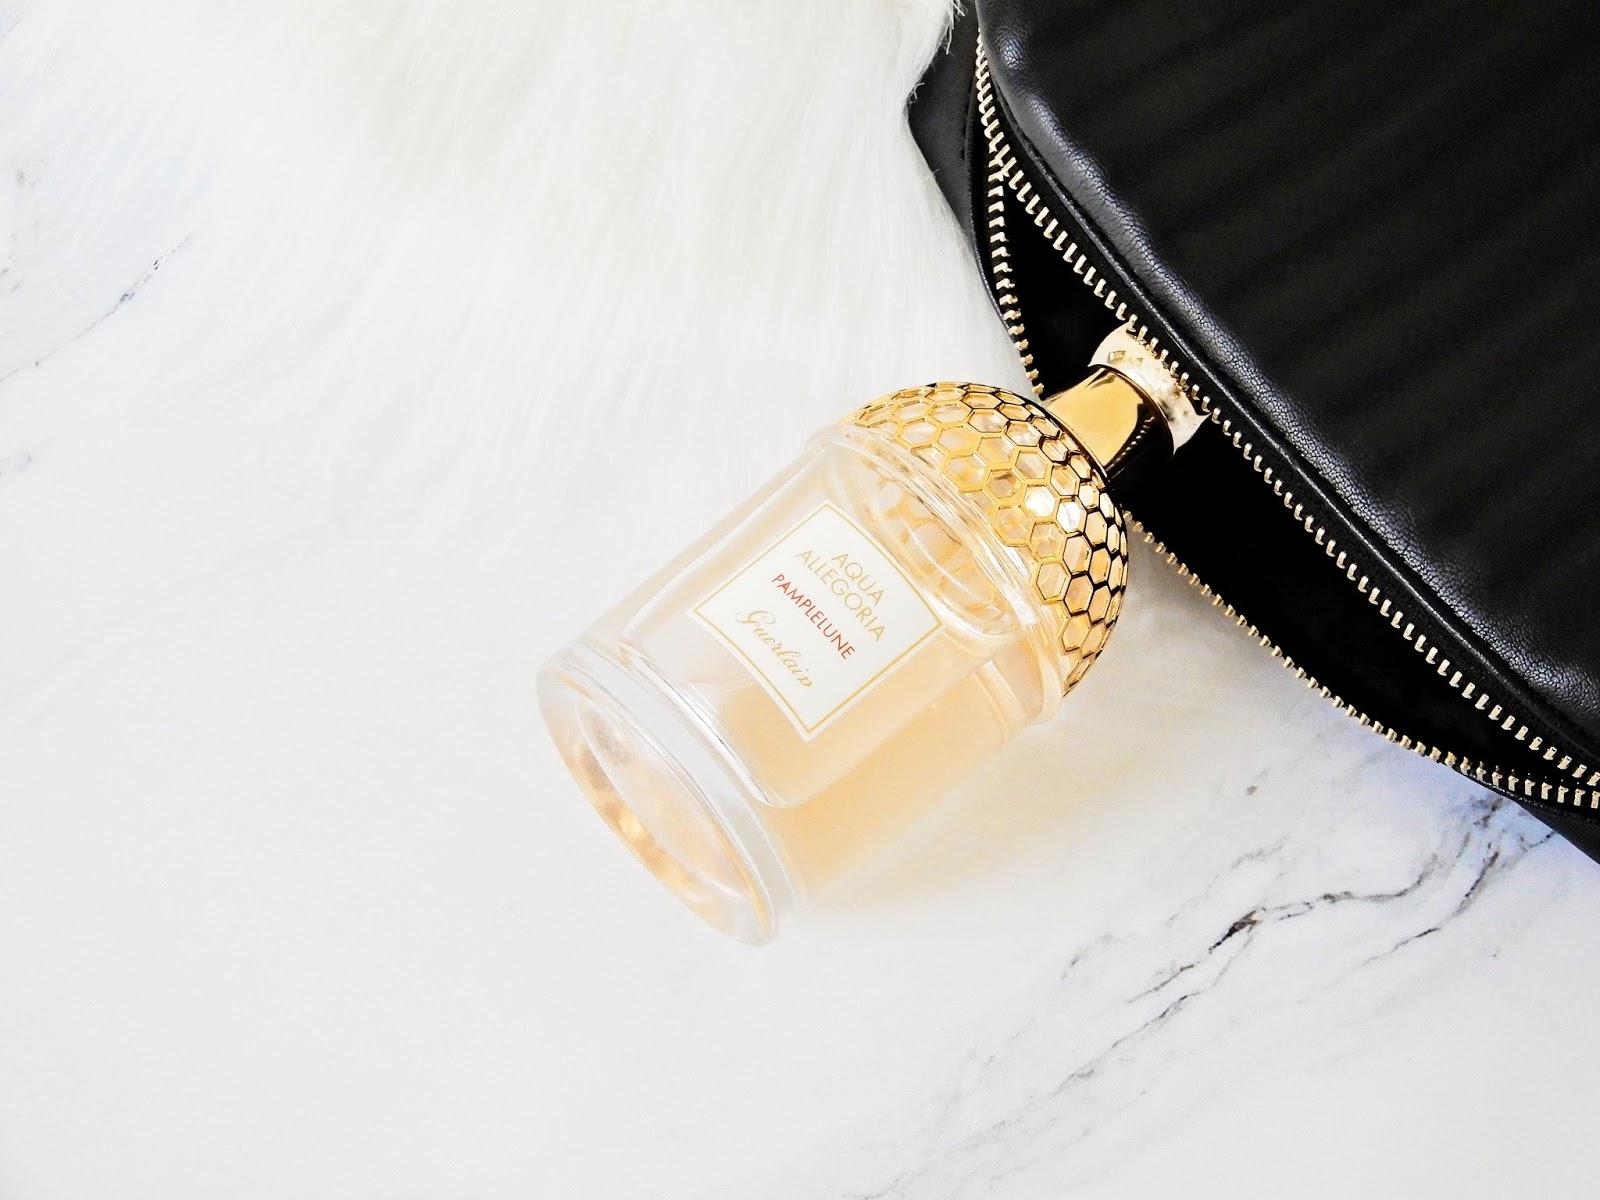 Aqua Allegoria Pamplelune marki Guerlain, cytrusowe perfumy, perfumy na lato,